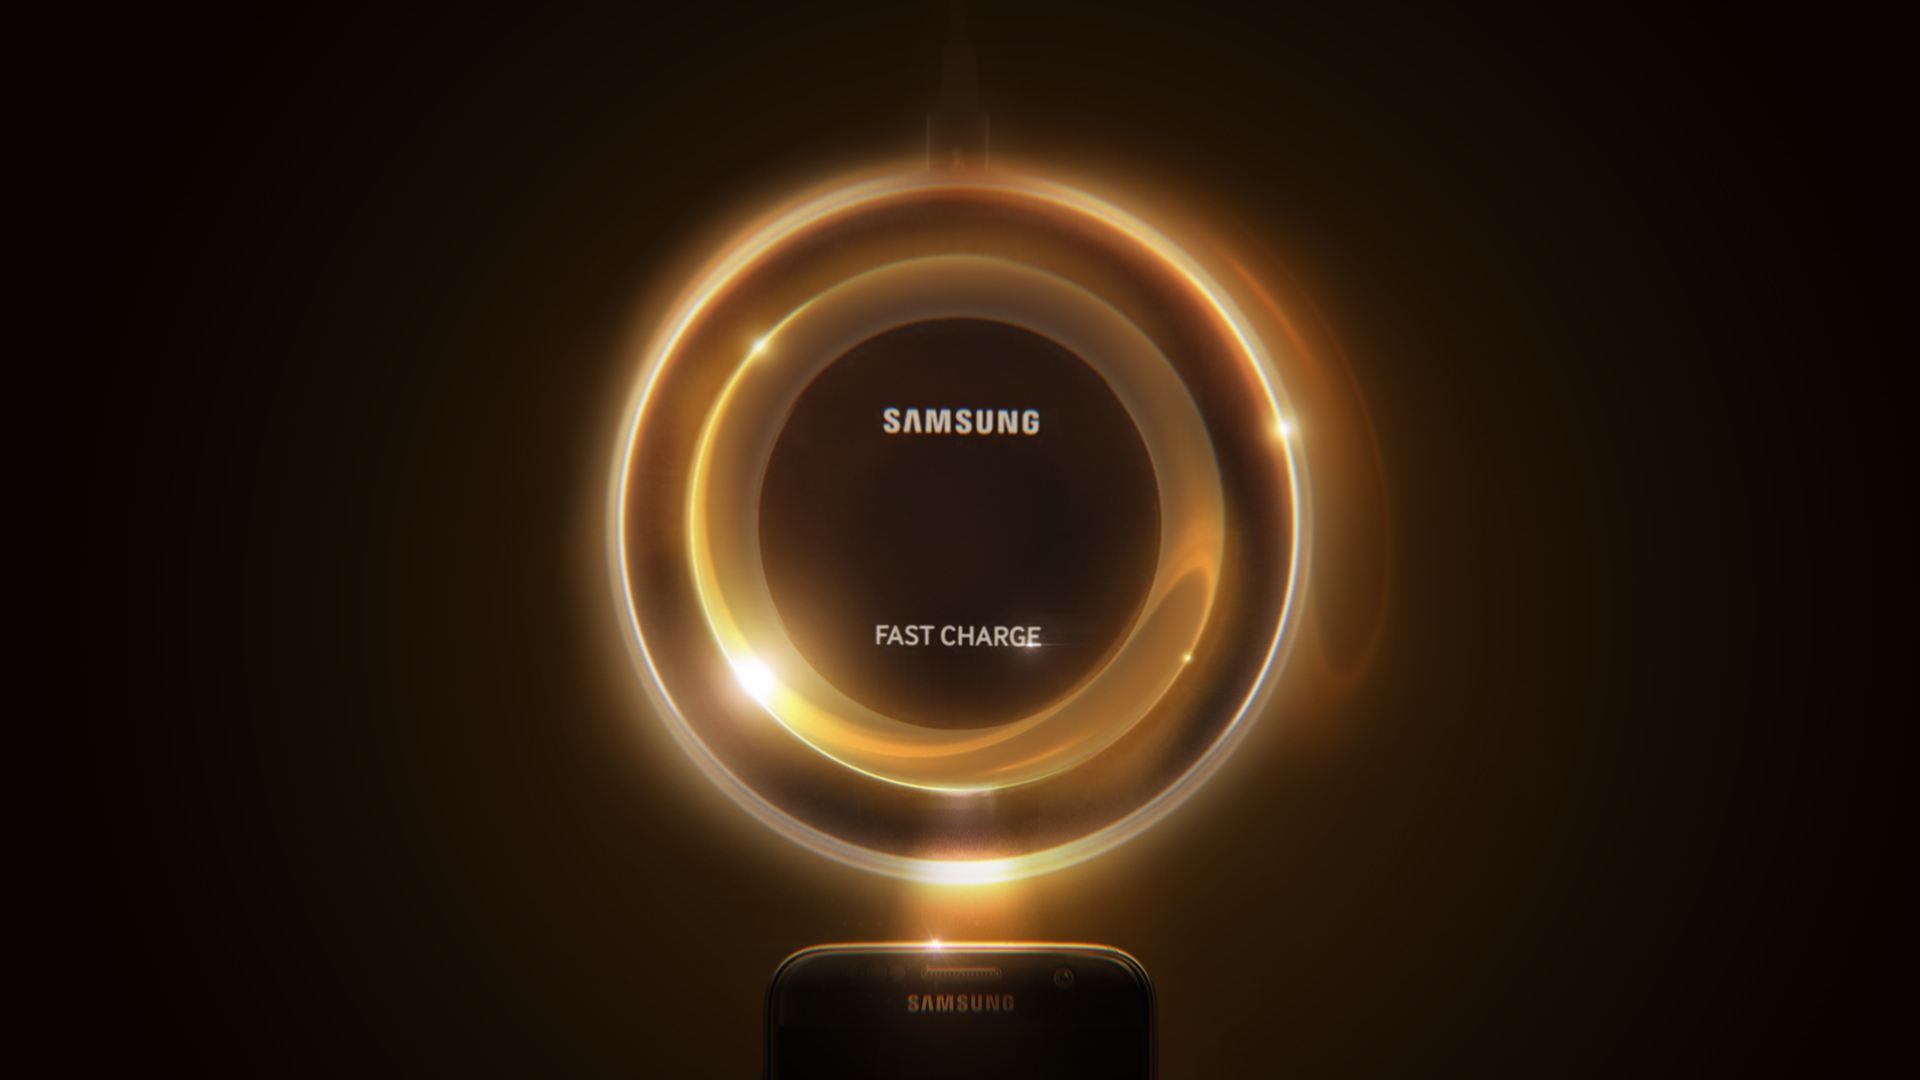 Galaxy_S7_Design_Treated_F15.jpg